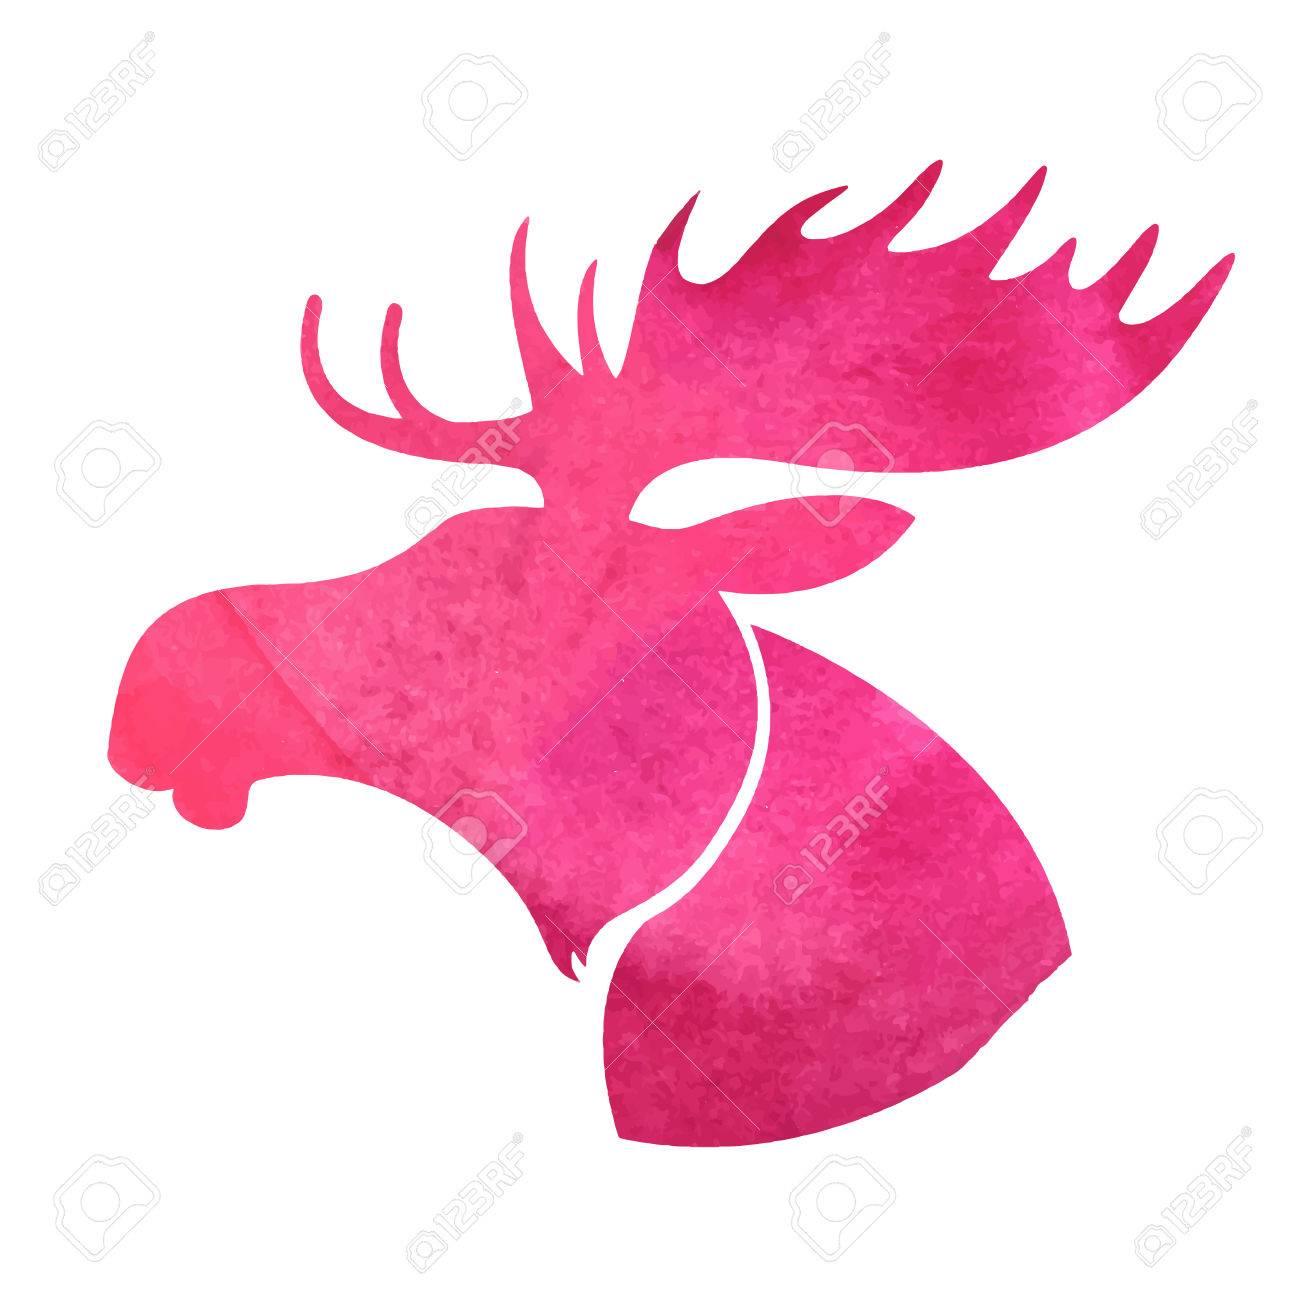 moose head watercolor silhouette royalty free cliparts vectors  - moose head watercolor silhouette stock vector